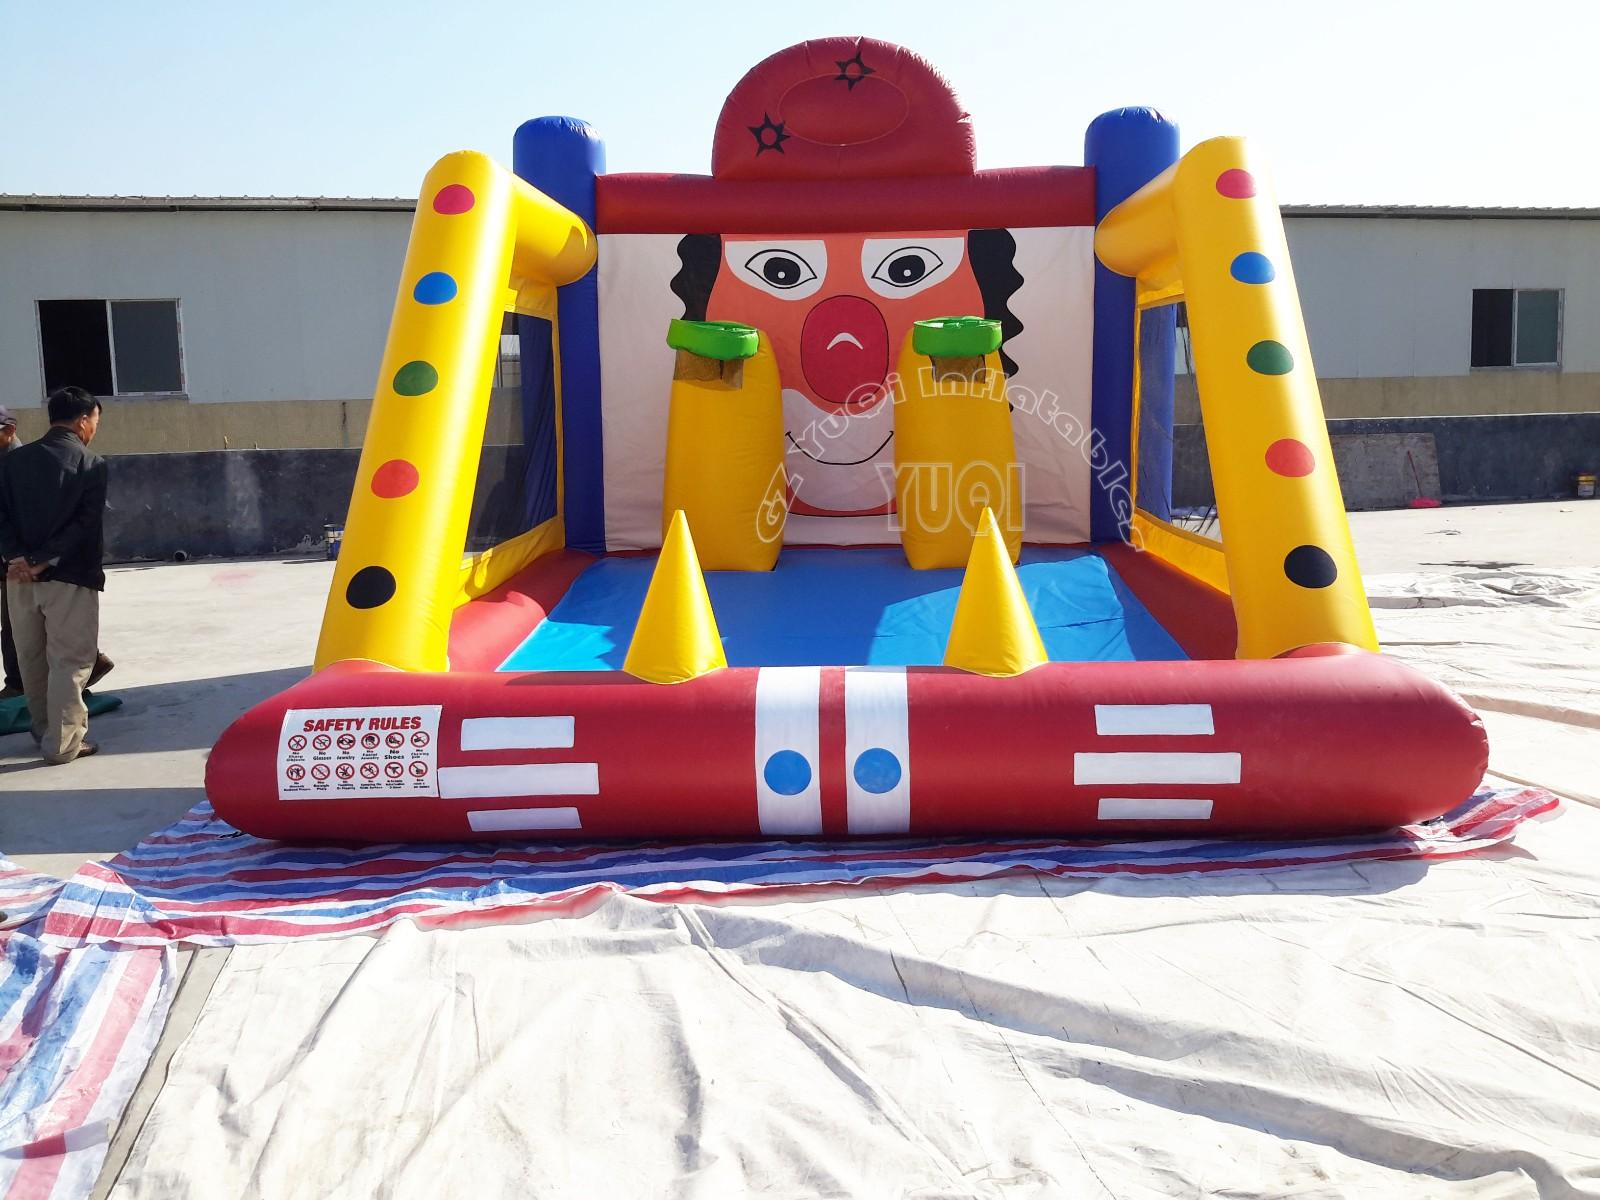 YUQI-Professional Yq671 Best Quality Basketball Hoop Inflatable Sport